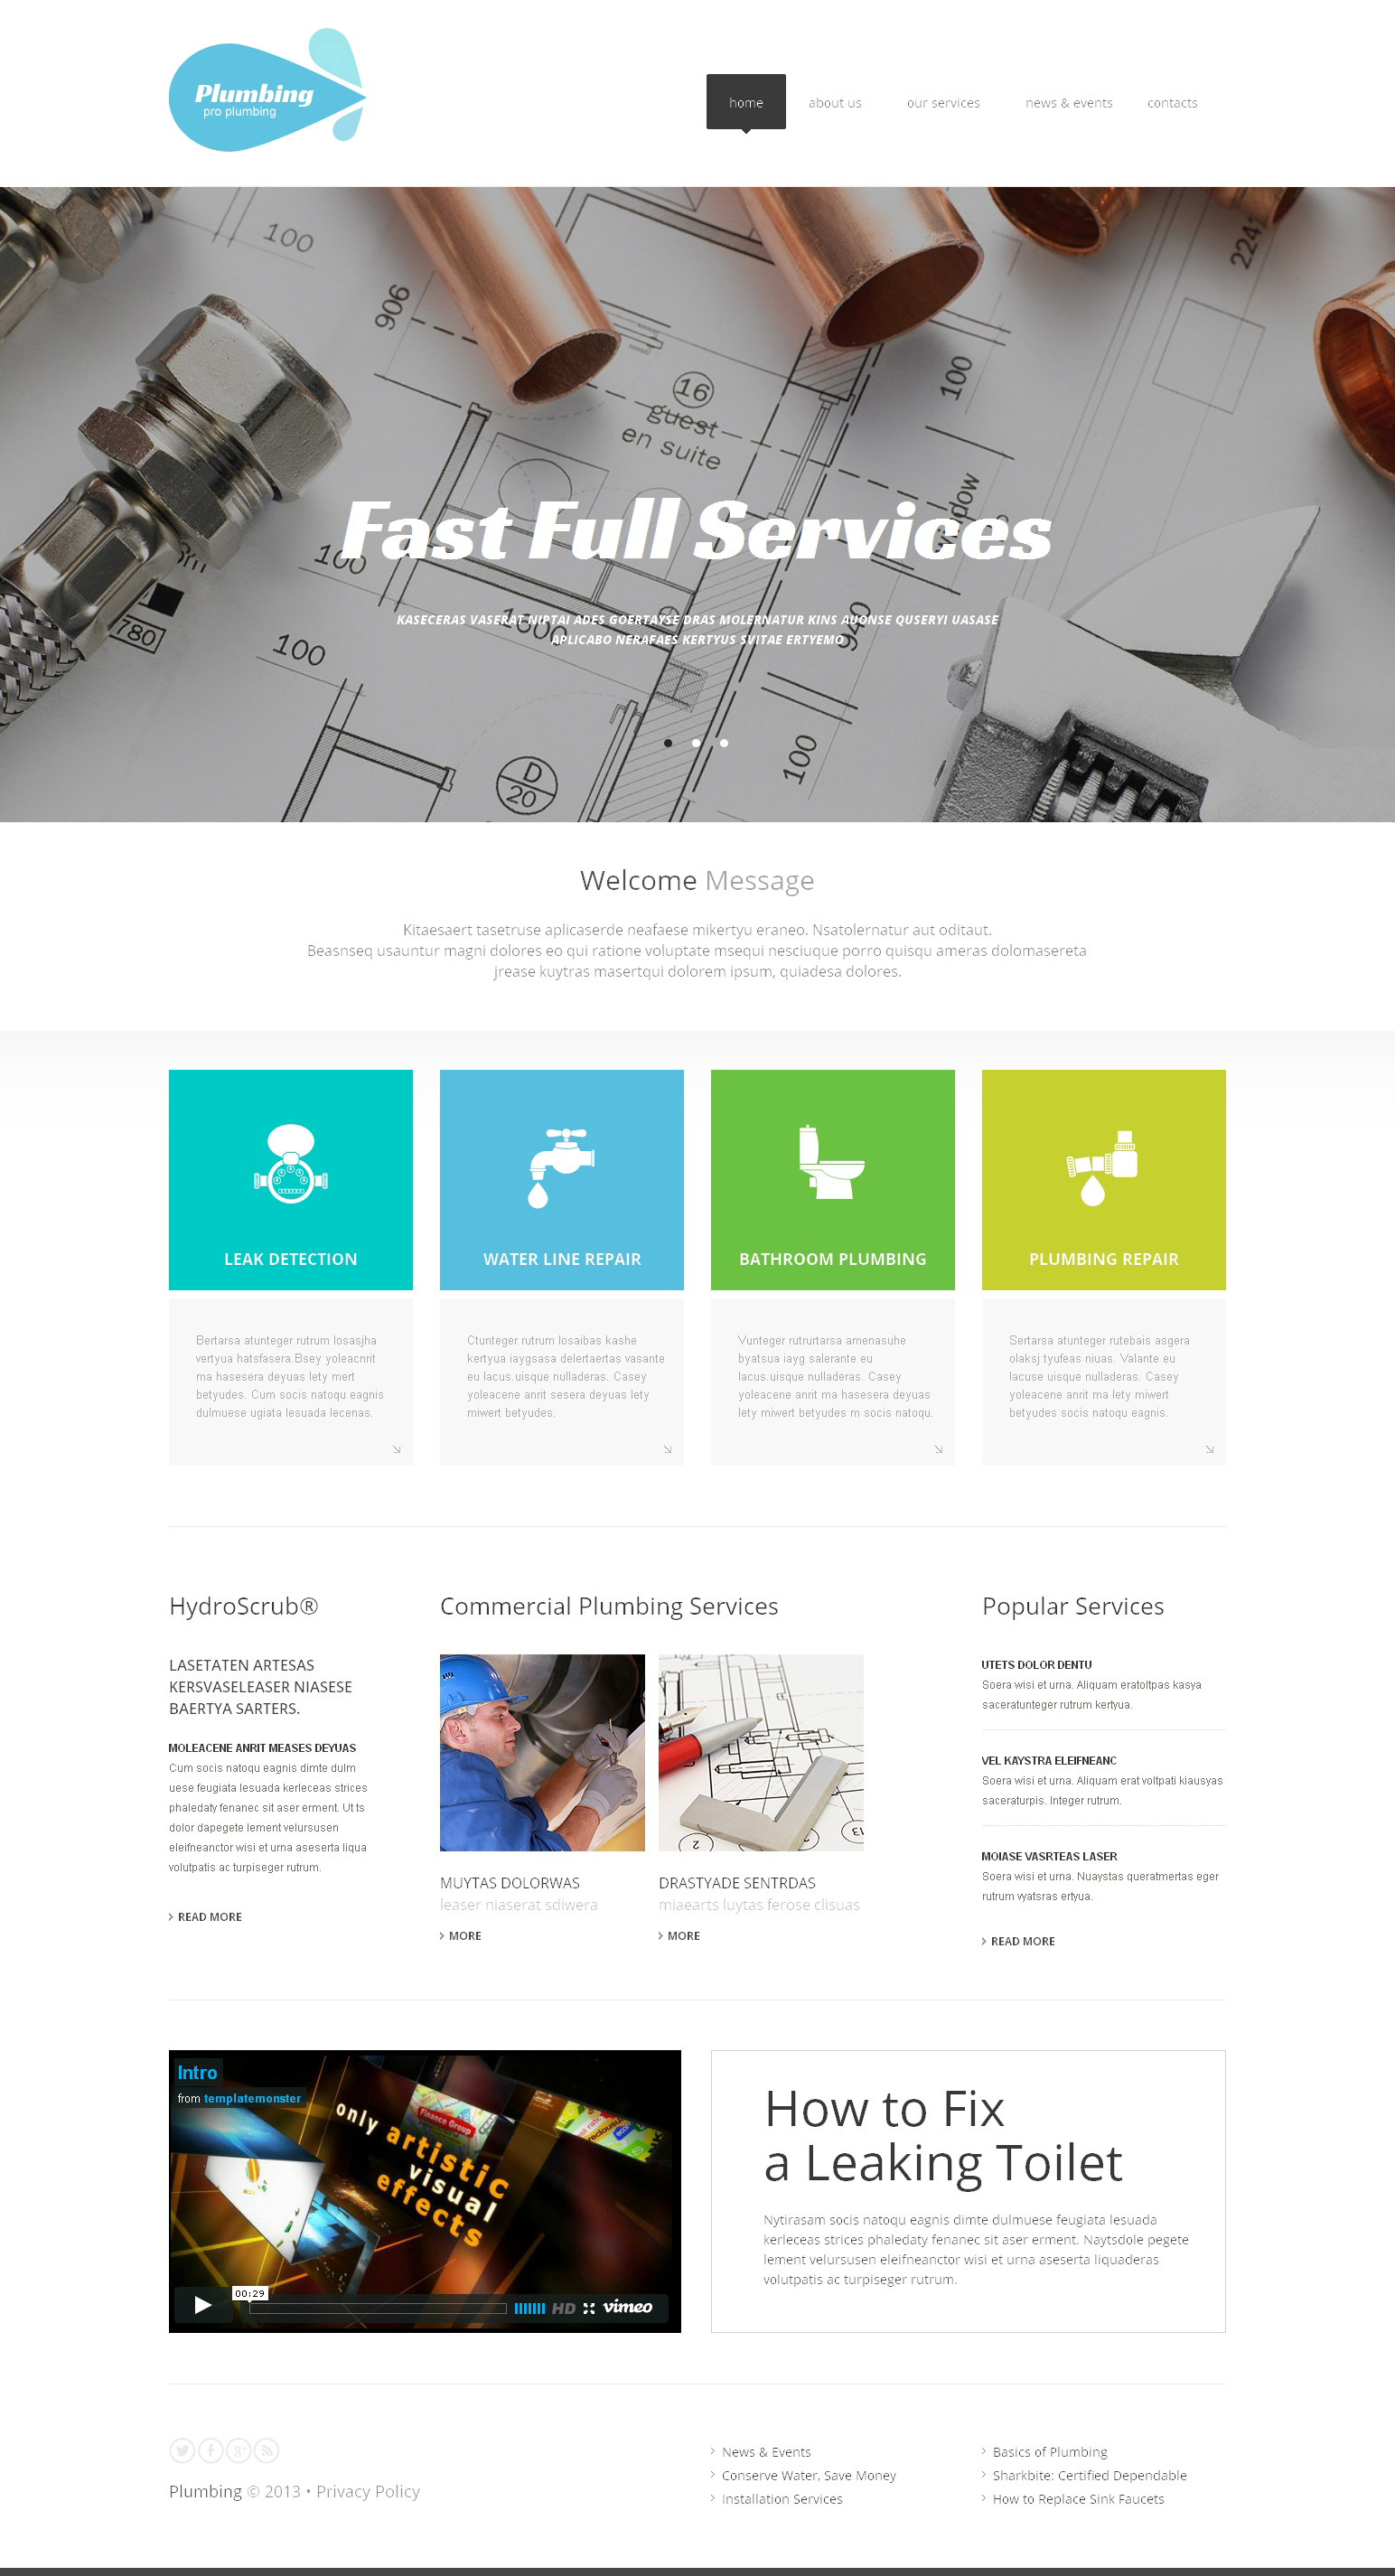 HTML Πρότυπα Χωρίς Διαχειριστικό